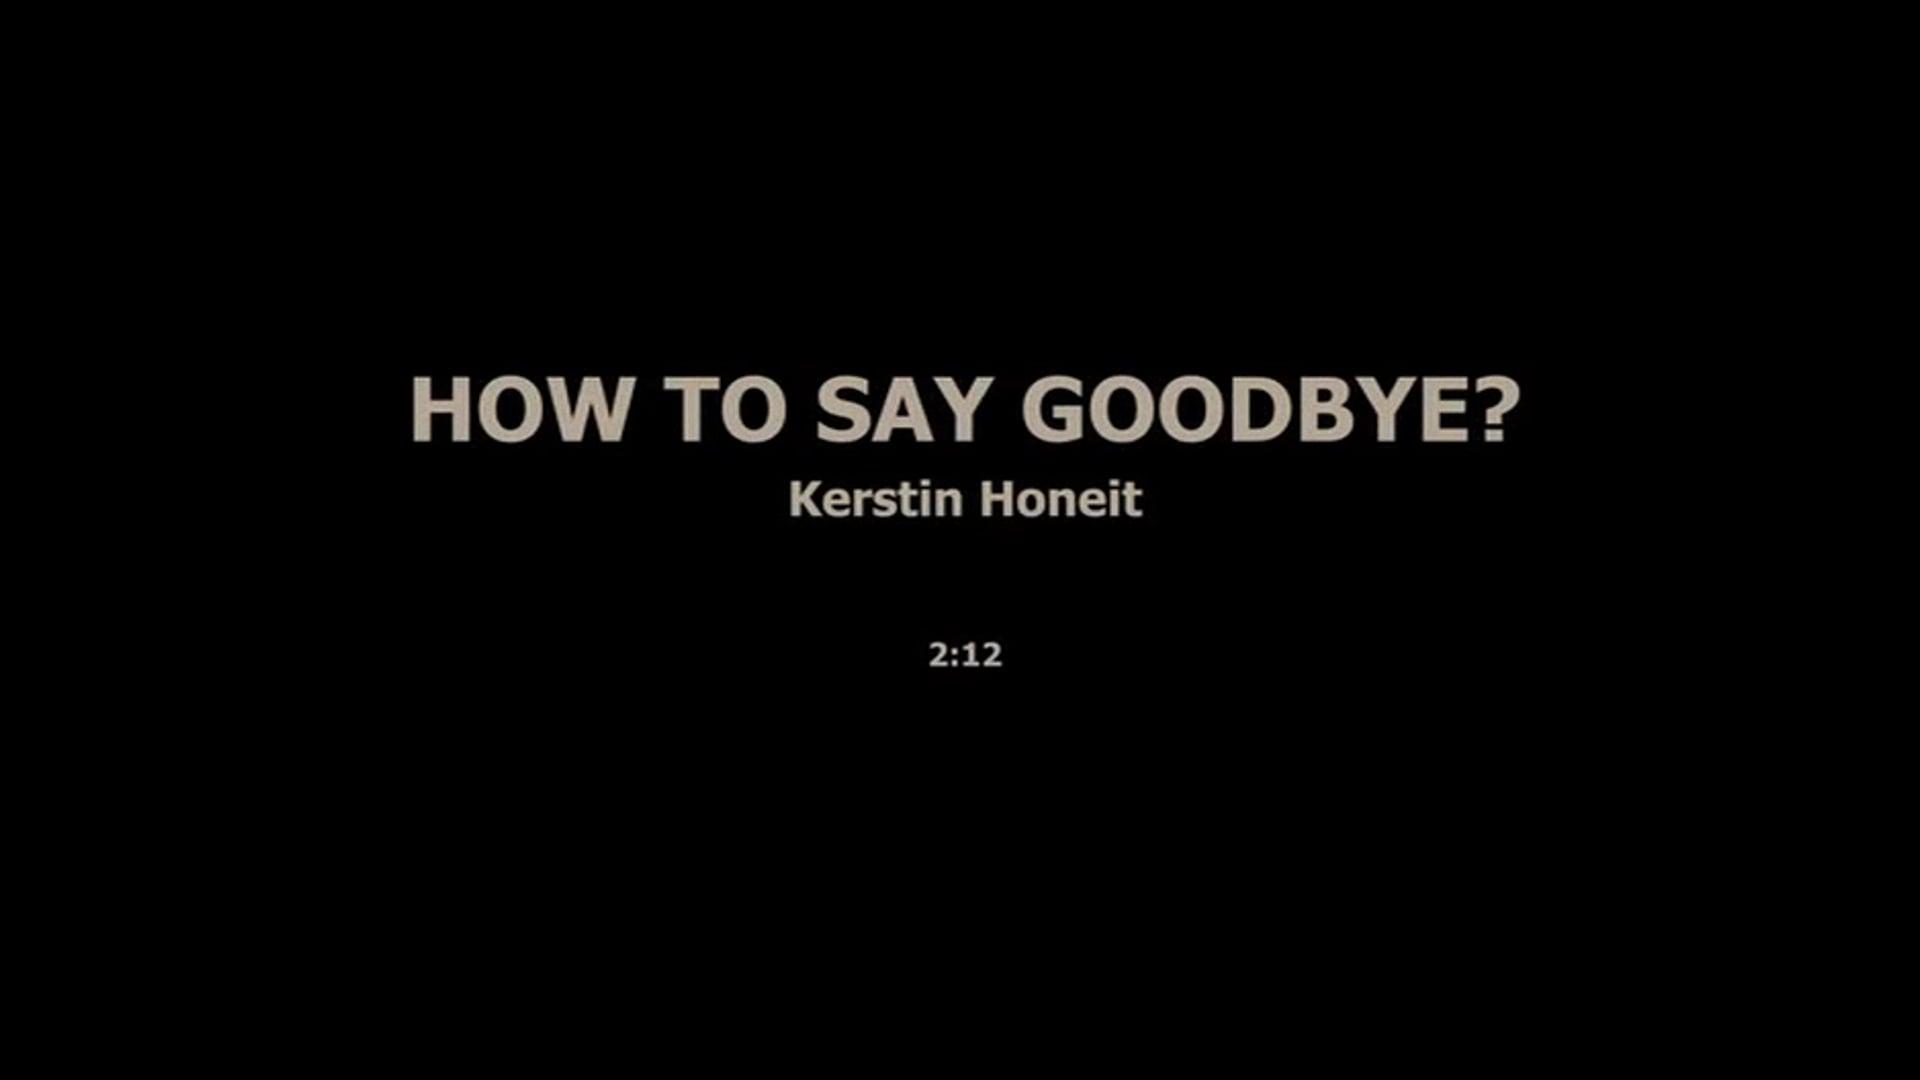 HOW TO SAY GOODBYE - KERSTIN HONEIT